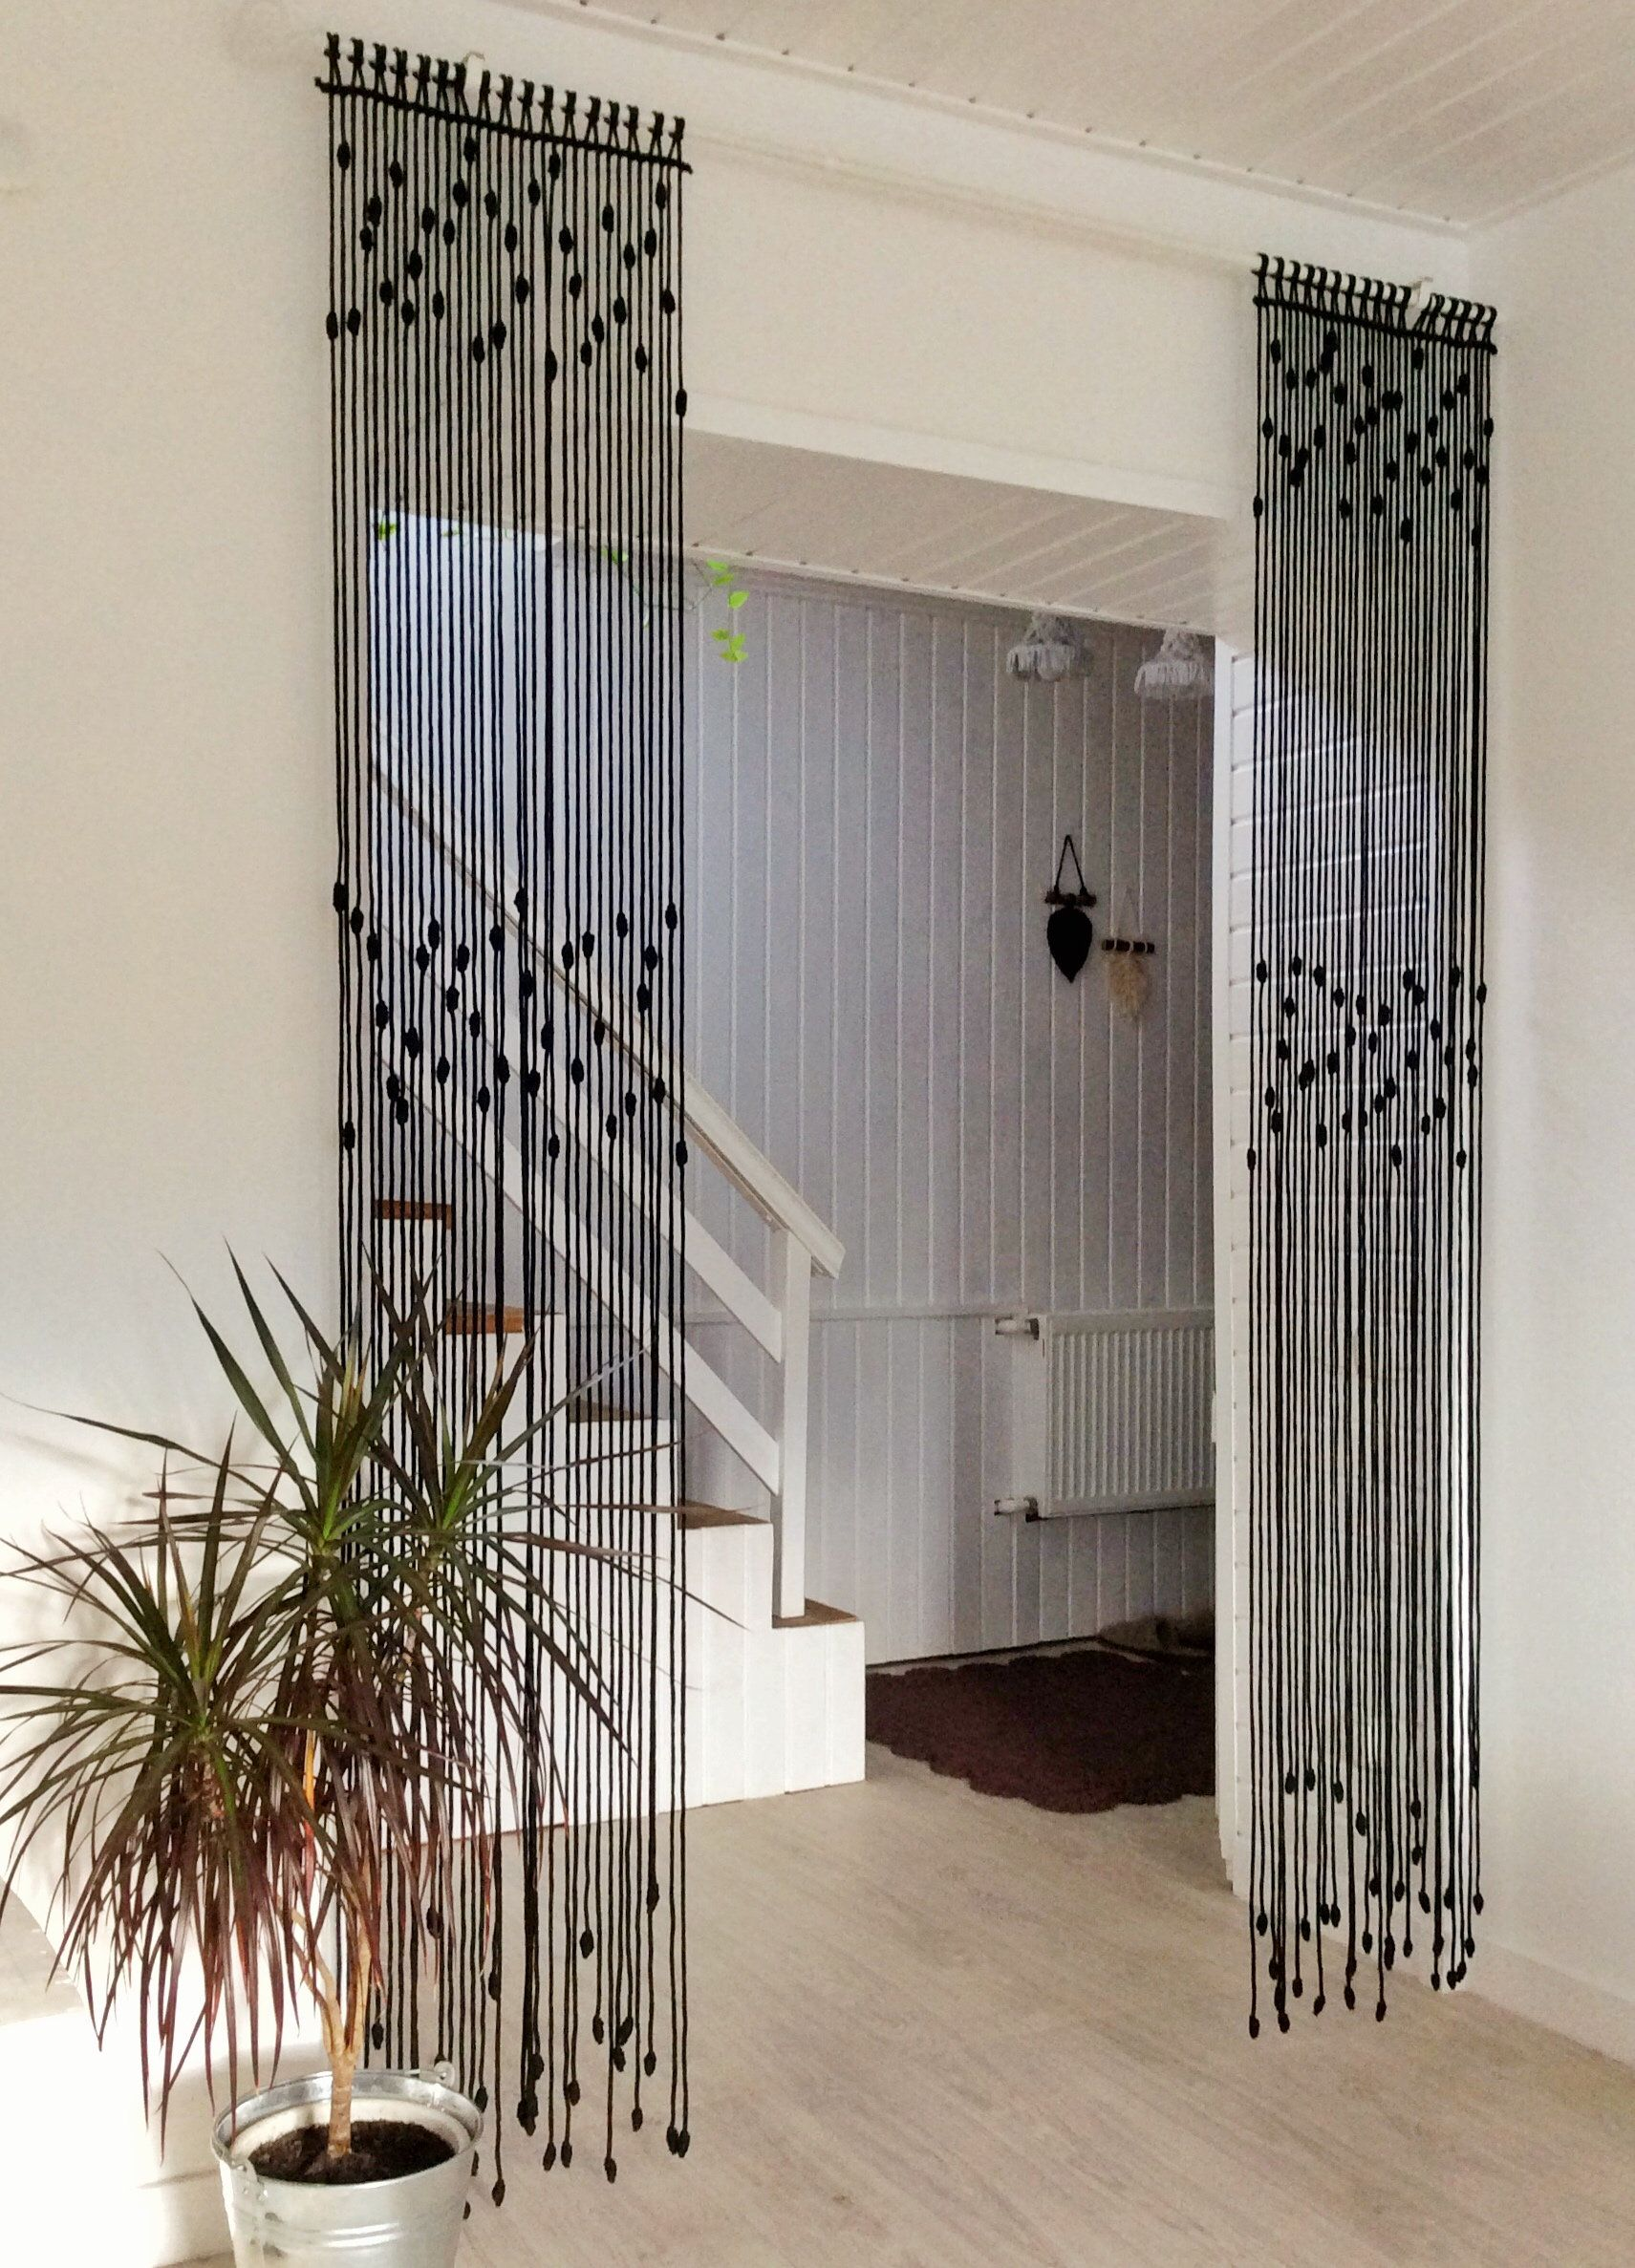 Macrame Curtain Room Partition Door Curtain Retro Wall Carpet Boho